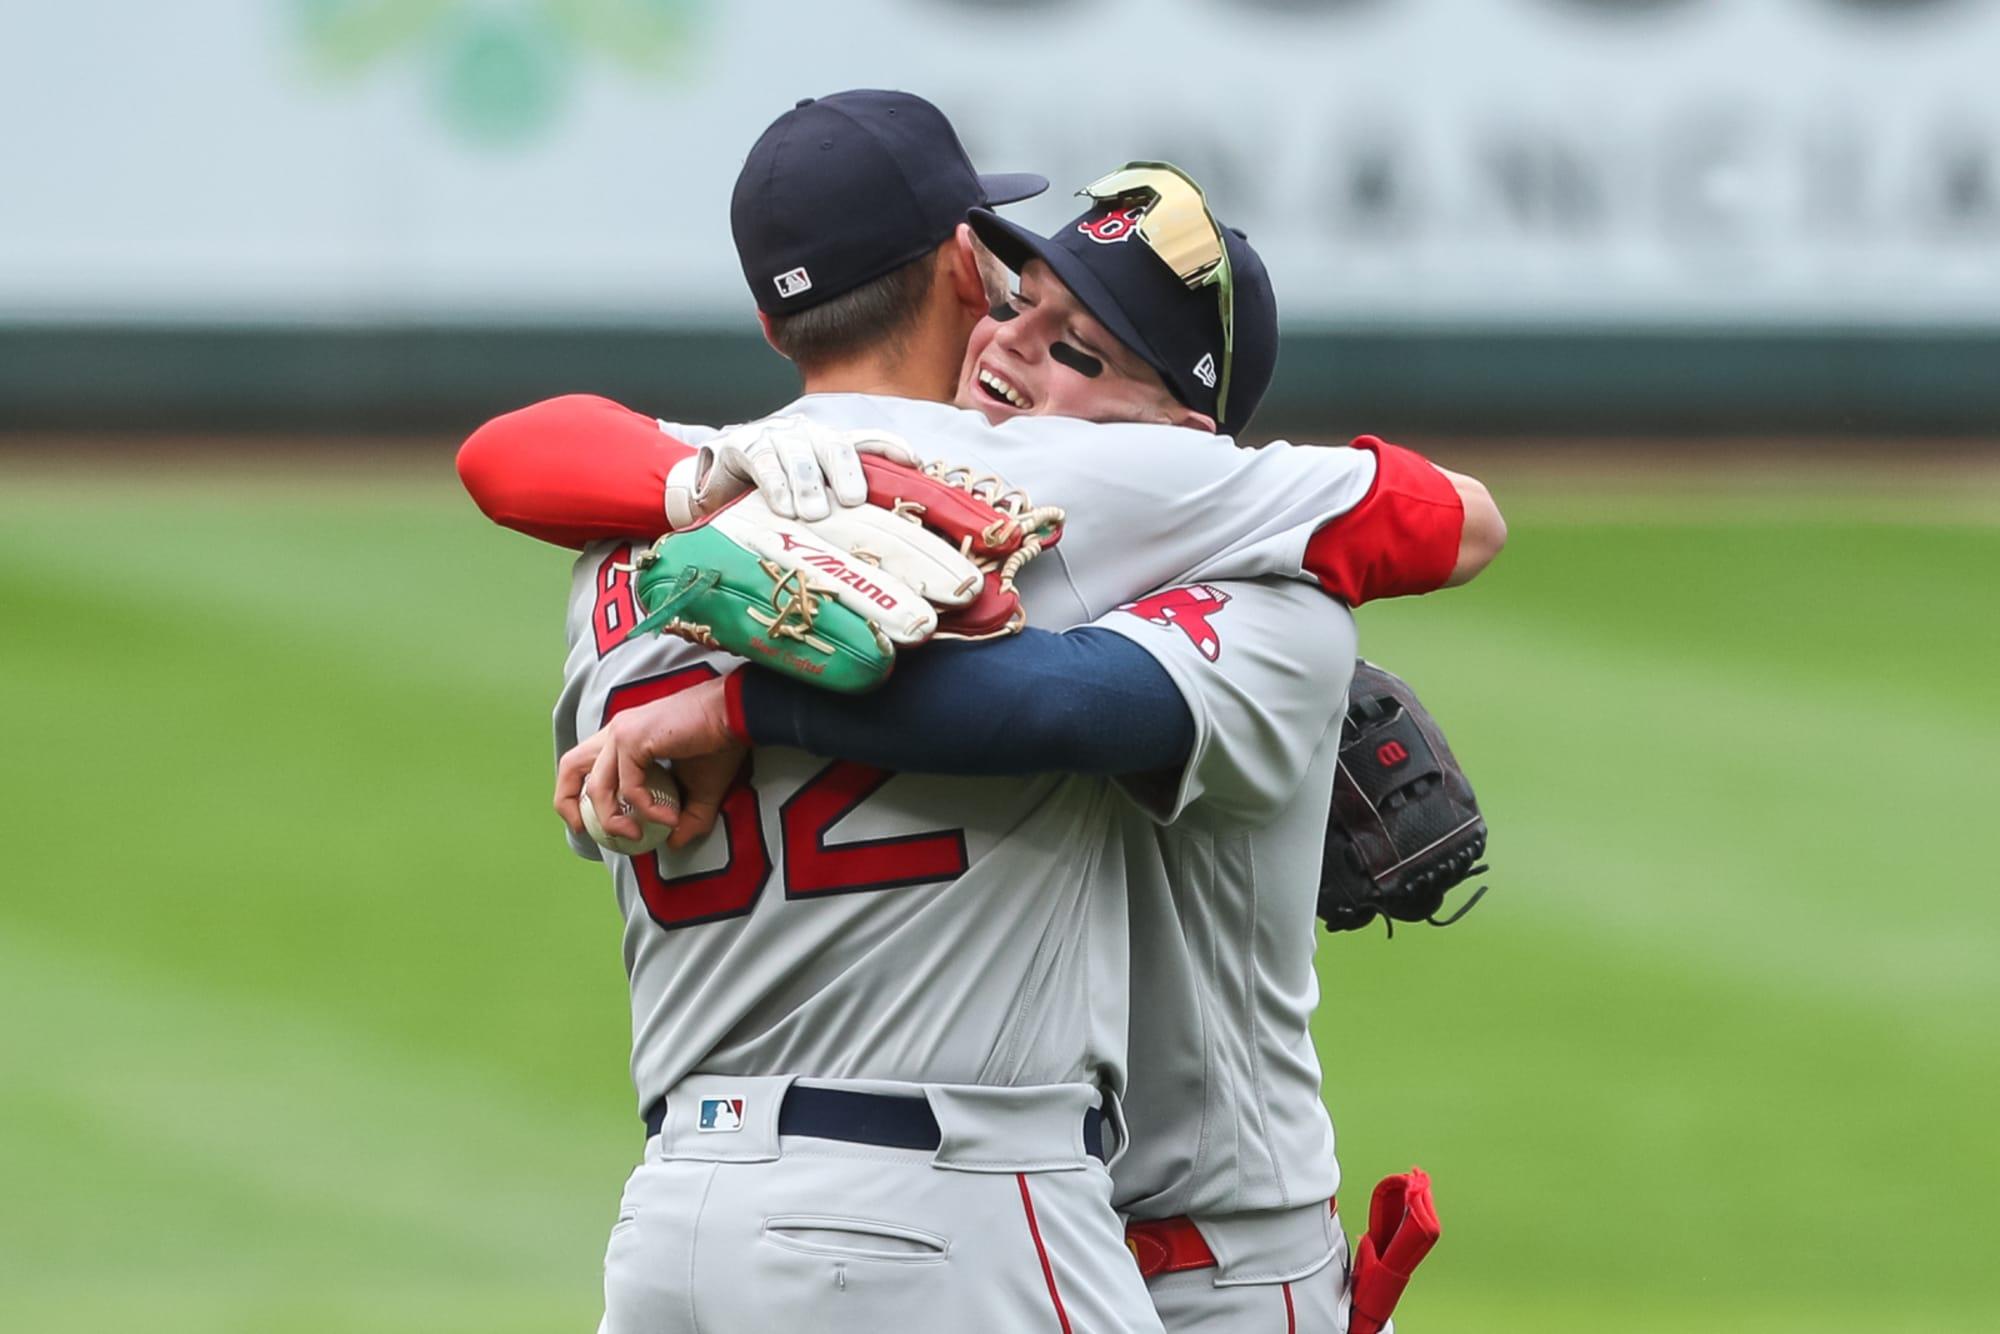 Red Sox: Alex Verdugo's amazing catch extends Boston's winning streak